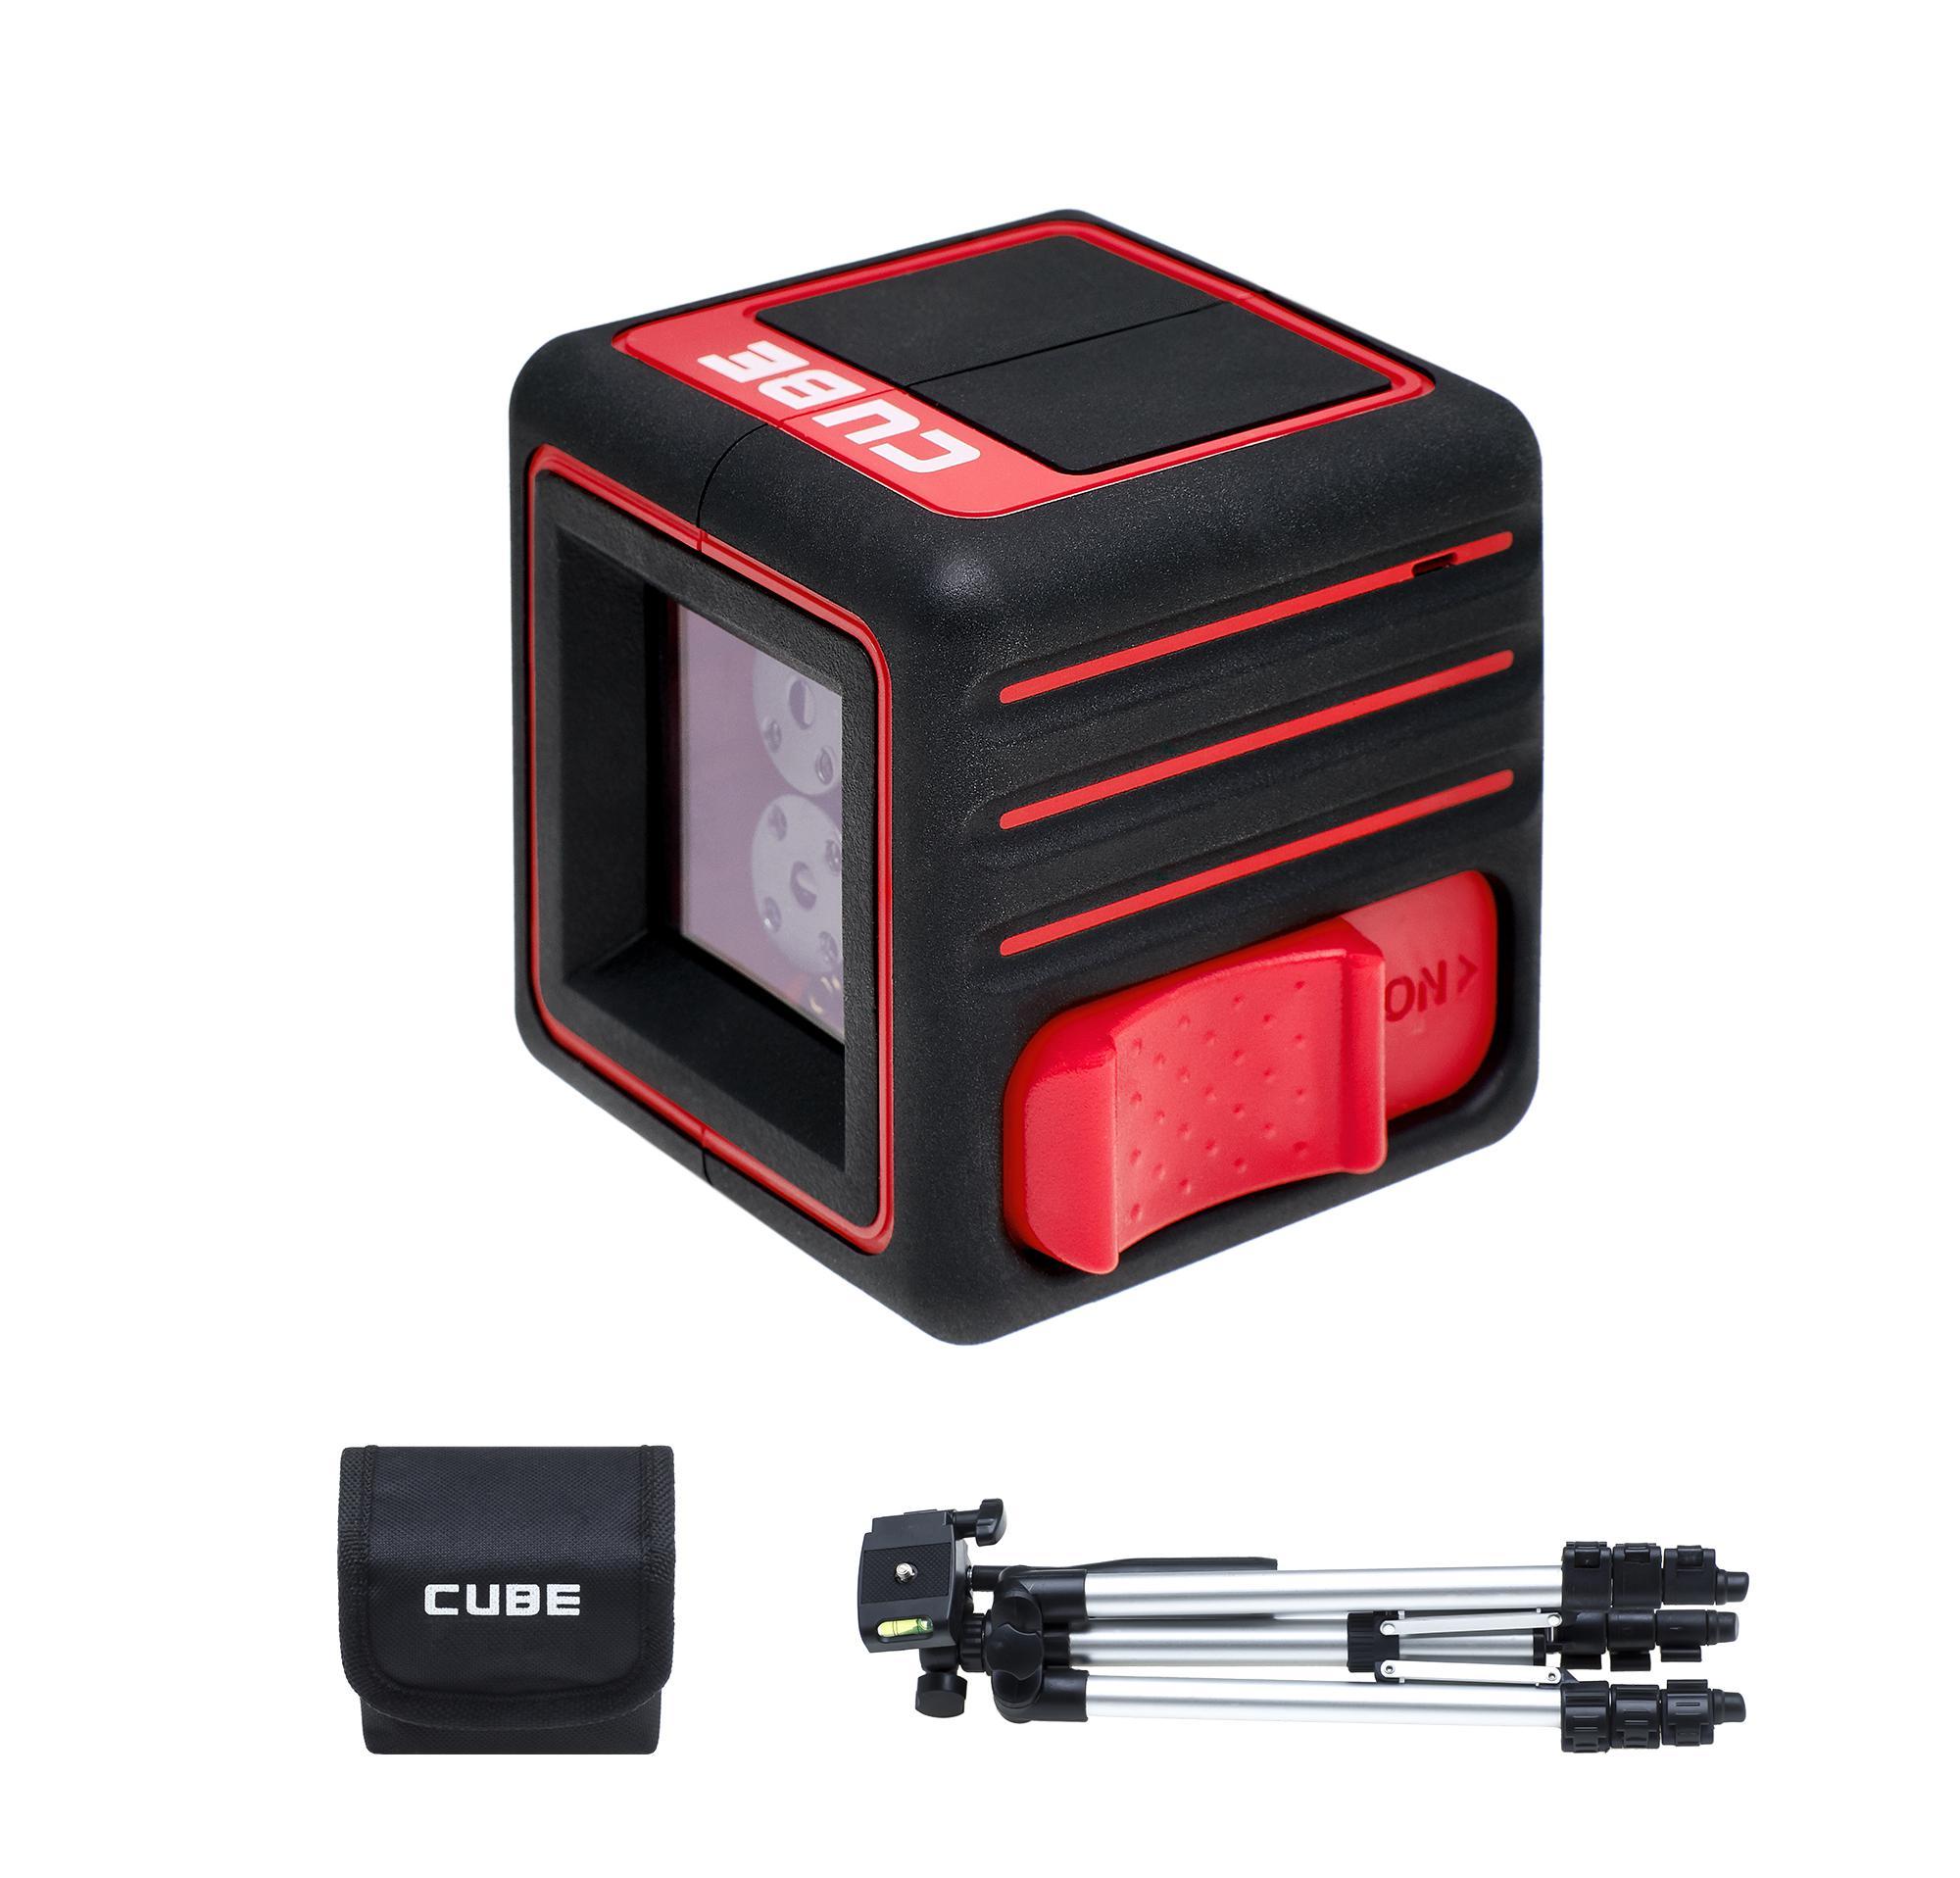 Cube professional edition 220 Вольт 2999.000